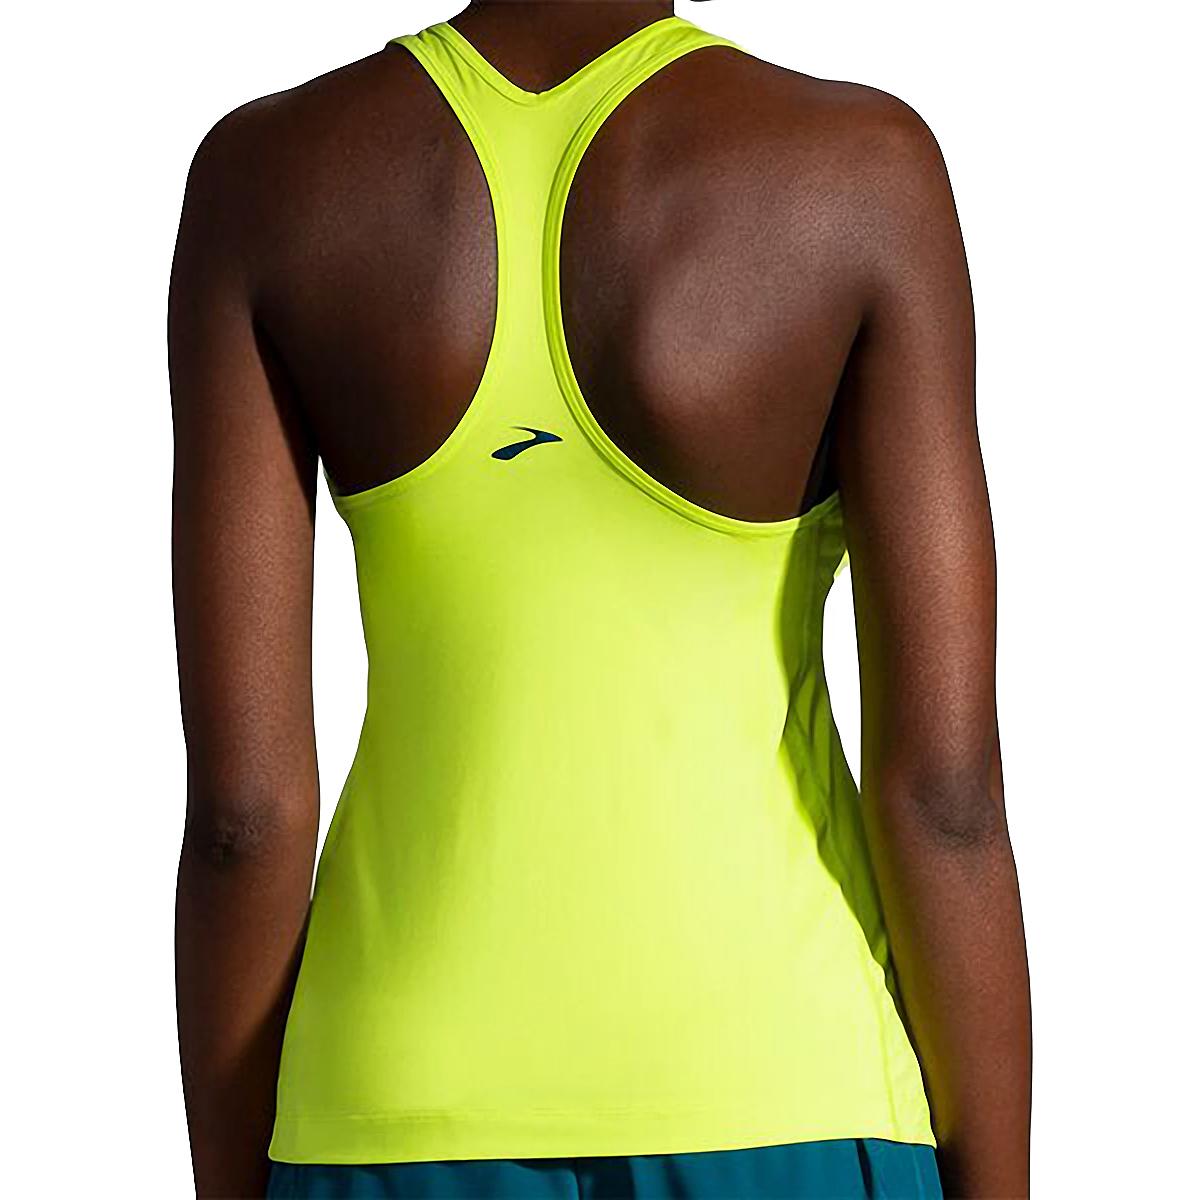 Women's Brooks Pick-Up Tank  - Color: Lime - Size: XS, Lime, large, image 2